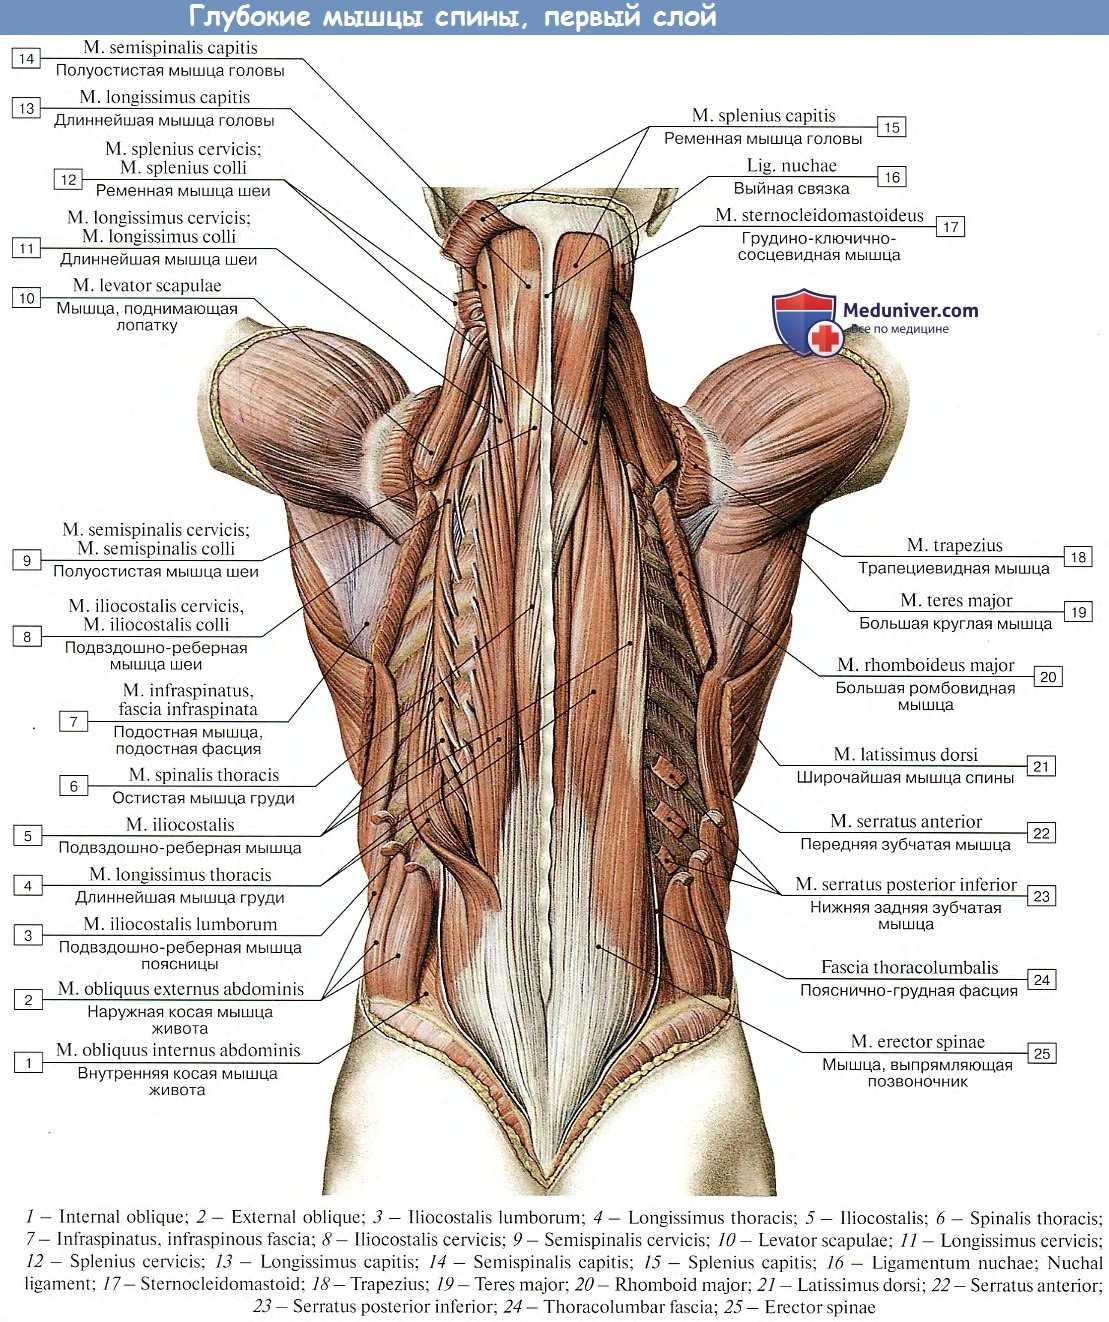 Мышцы спины глубокие анатомия картинки